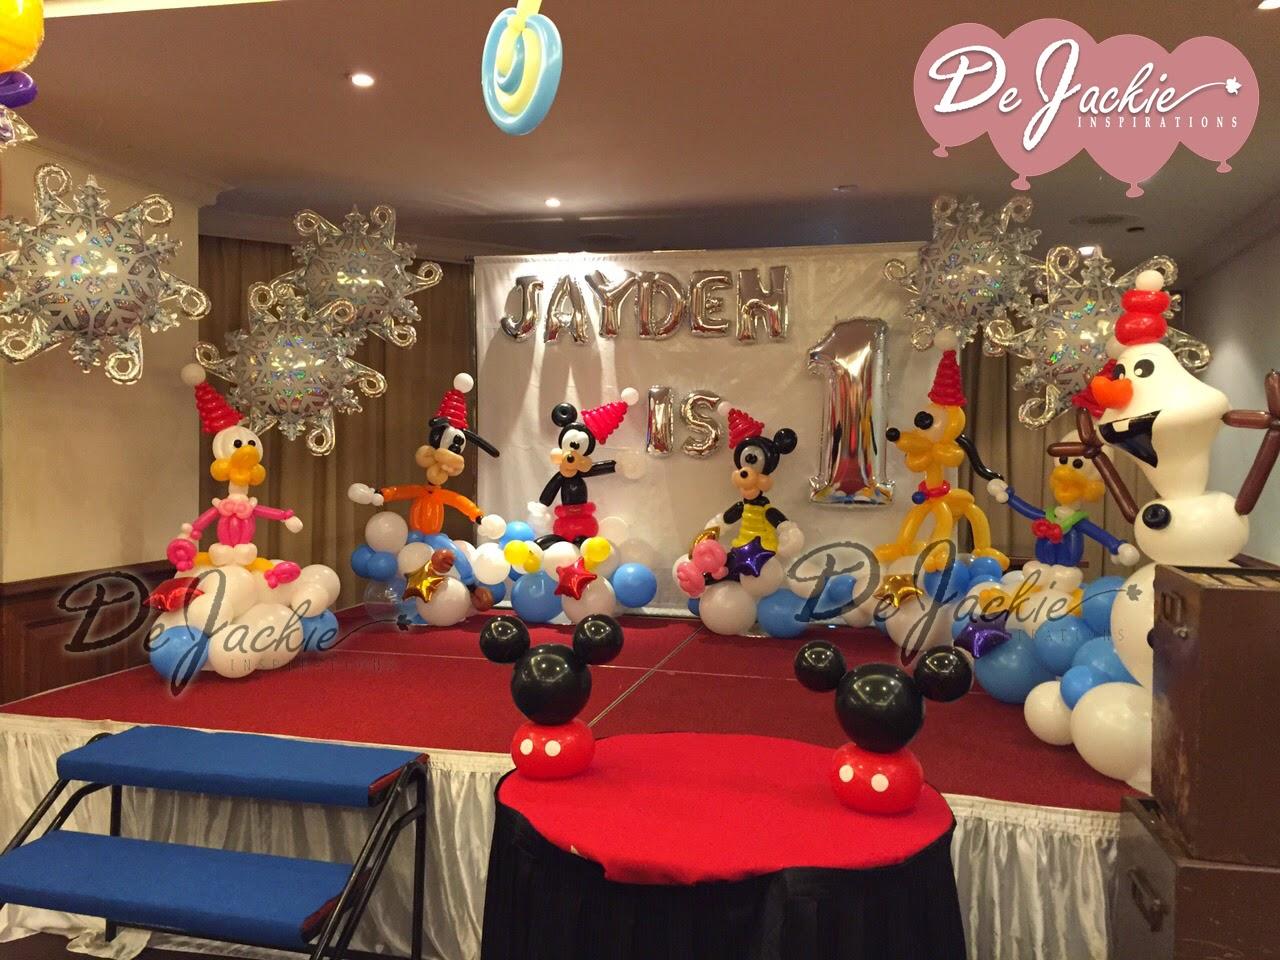 Balloon decorations for weddings, birthday parties, balloon sculptures ...